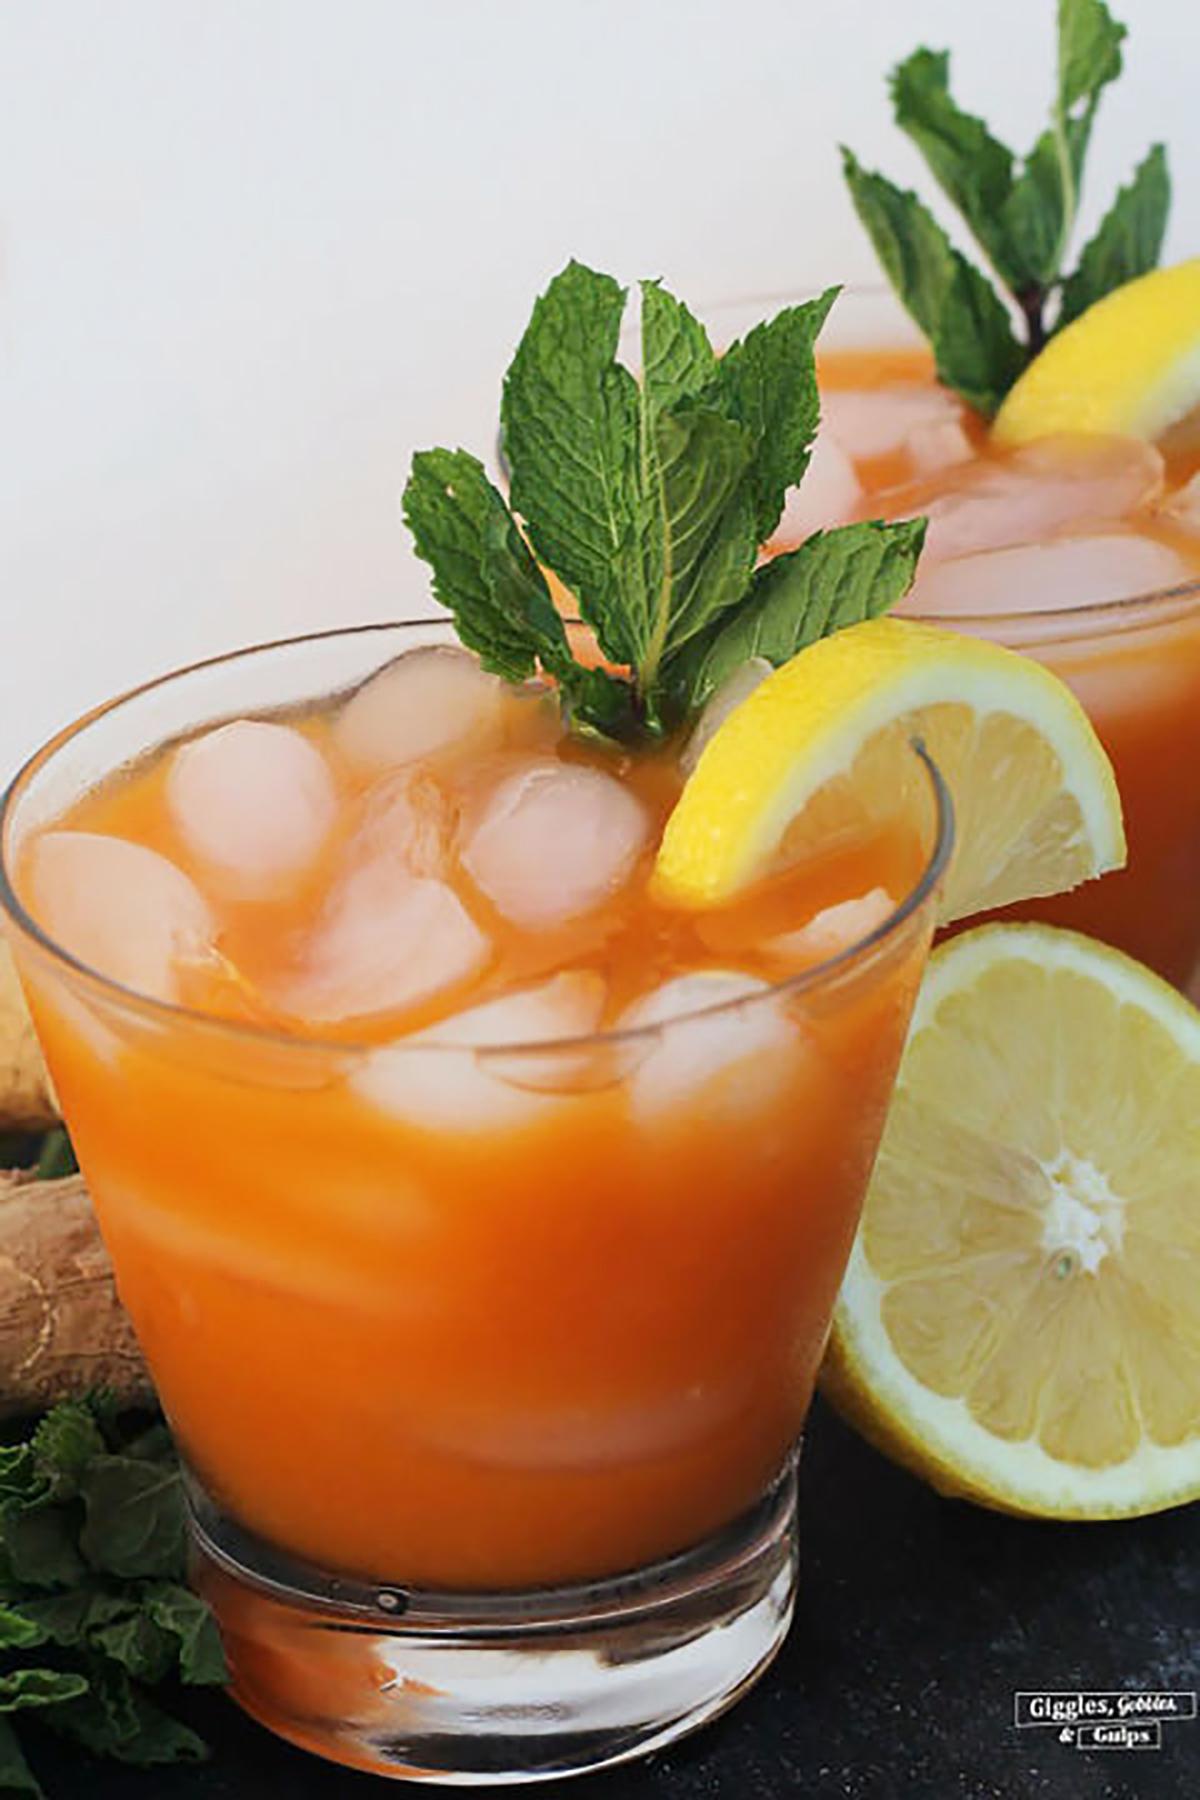 16 Best Easter Cocktails - Easy Alcoholic Easter Drinks